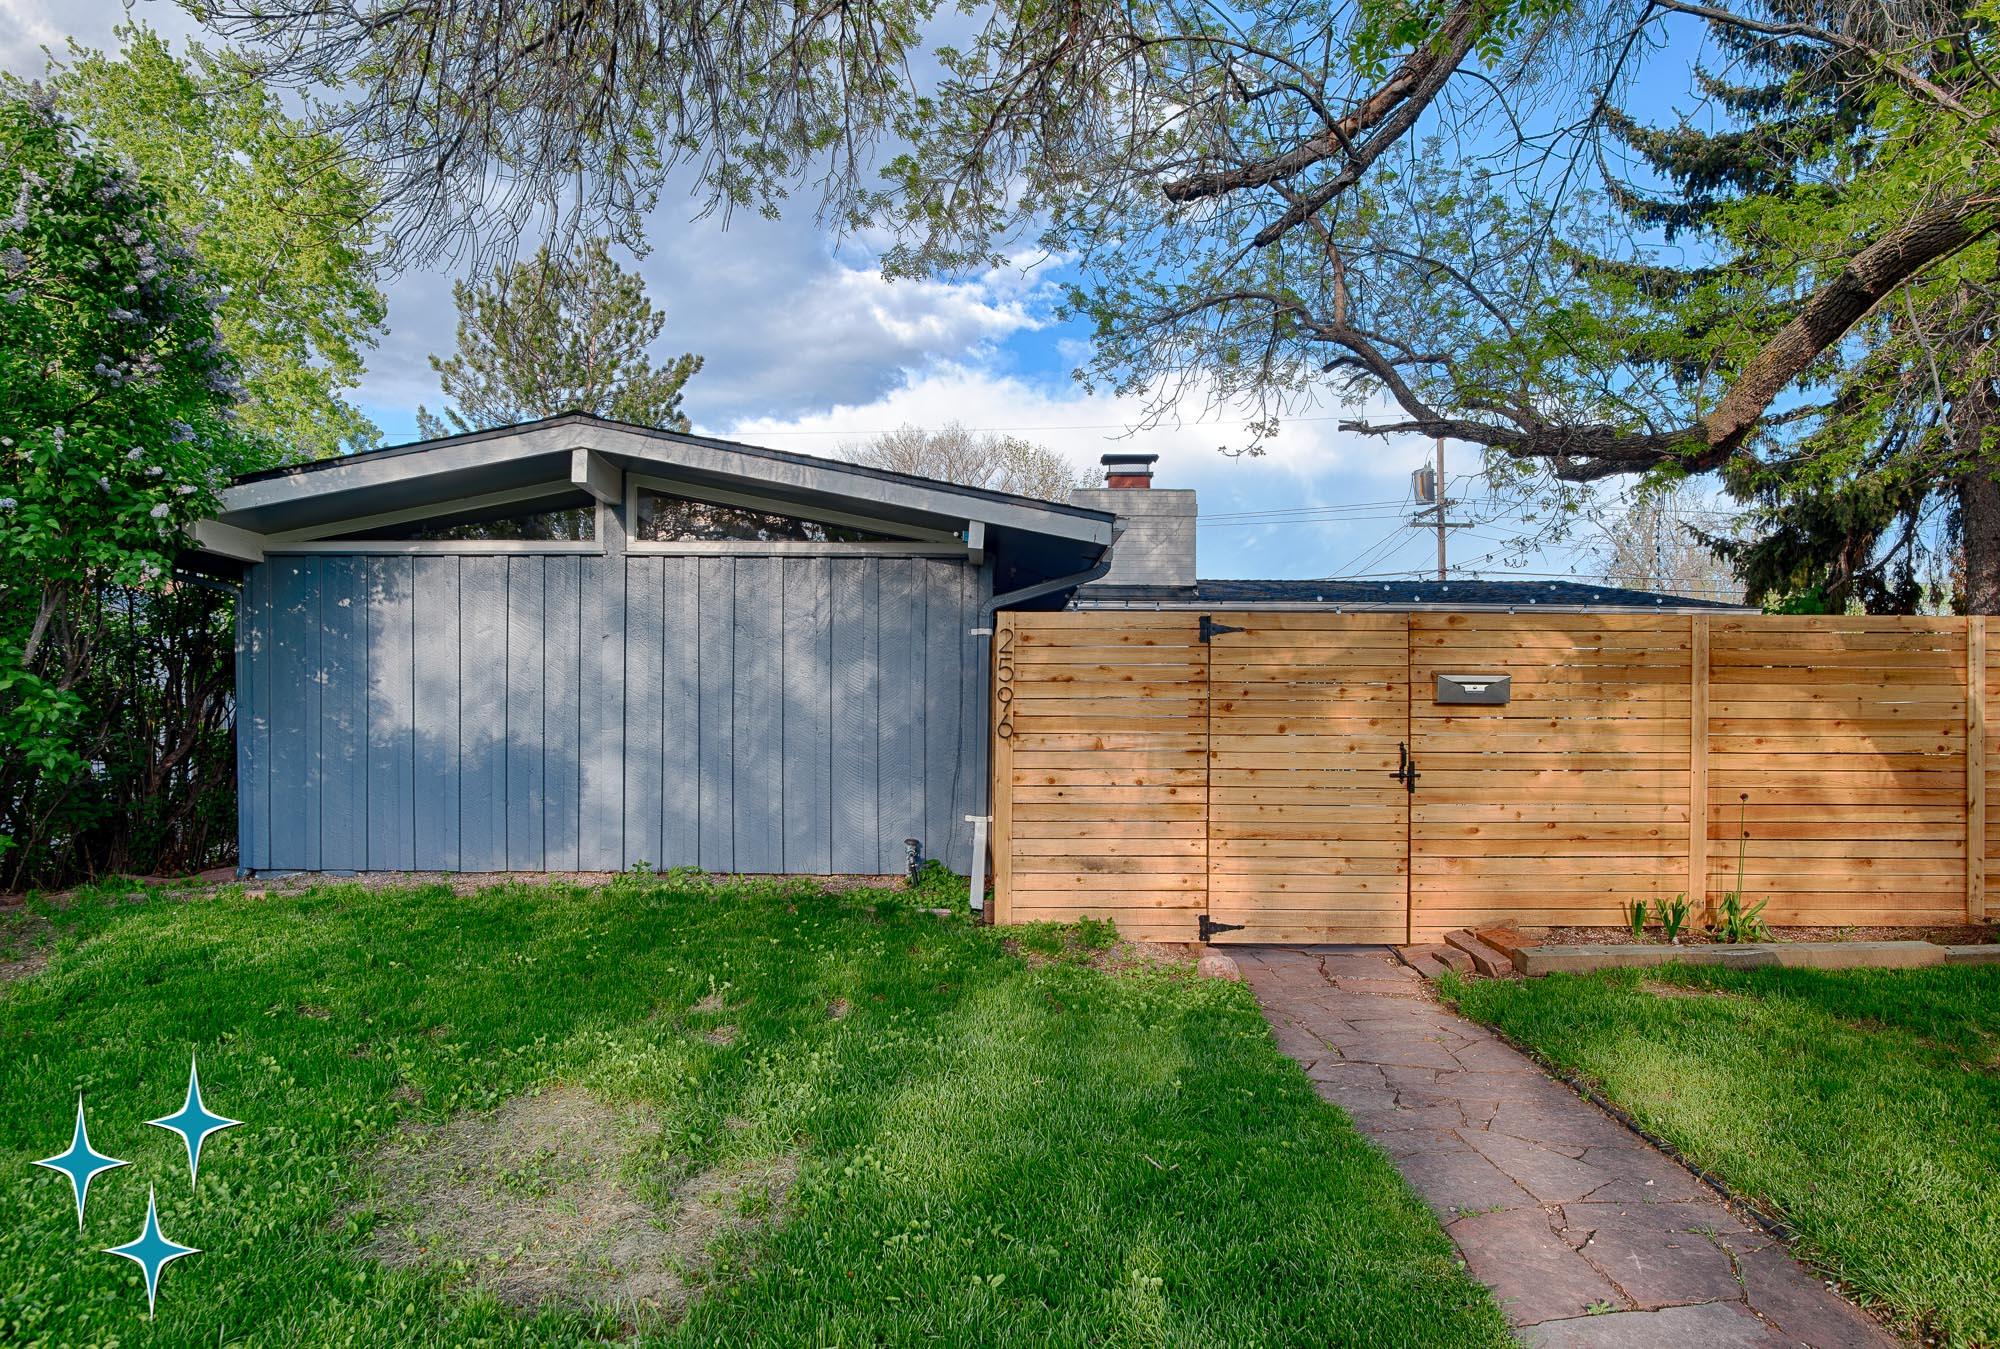 Adrian-Kinney-2596-S-Osceola-Street-Denver-Cliff-May-Harvey-Park-2000w50-3SWM-4.jpg